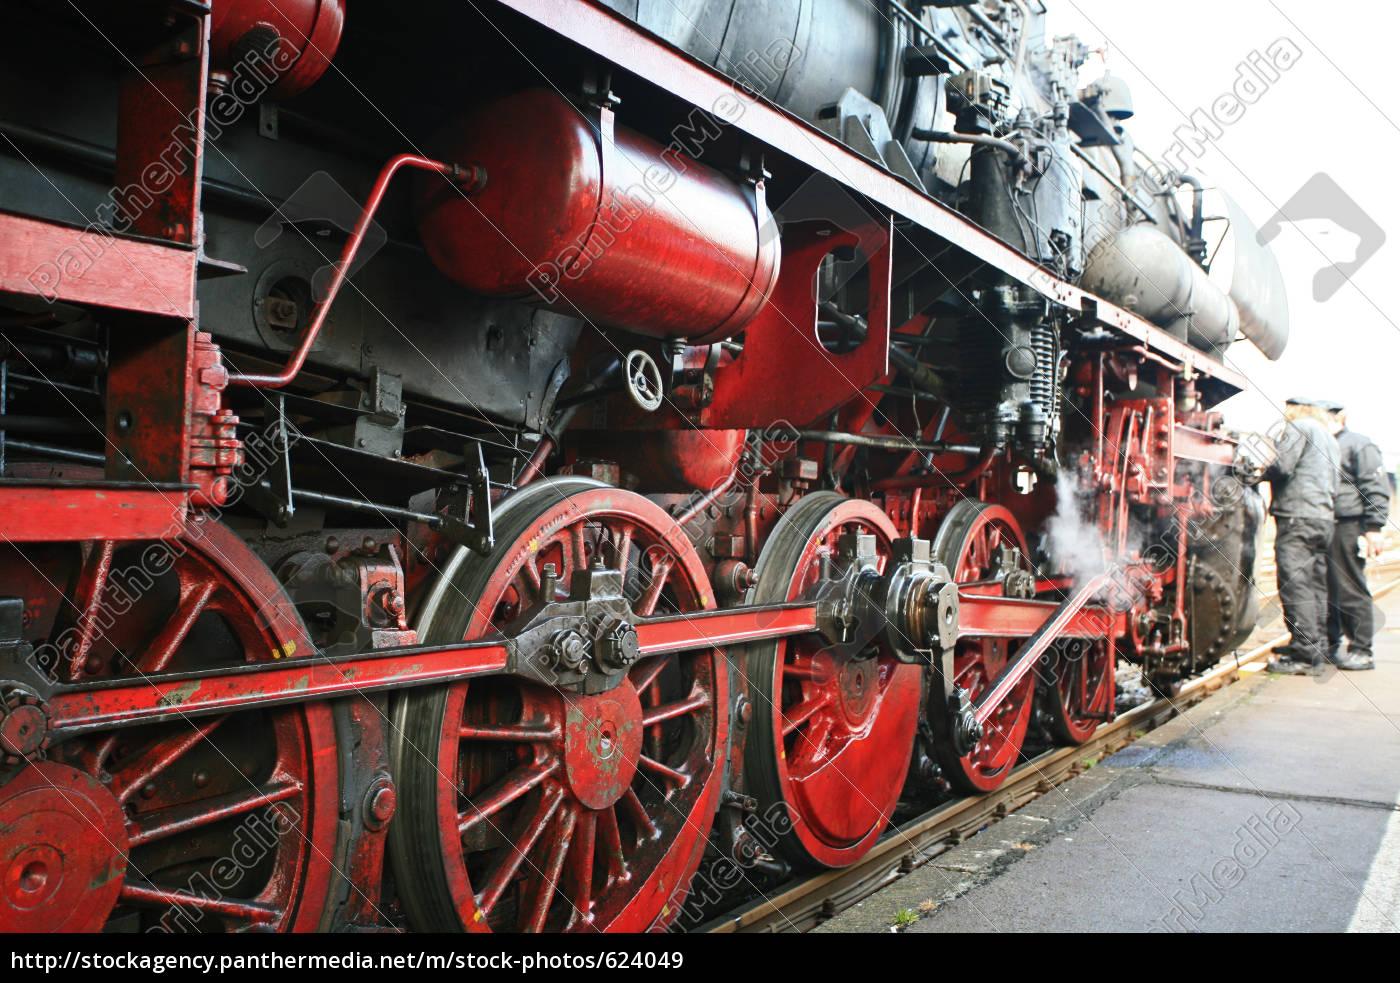 räde, rotary, axes, of, a, locomotive - 624049